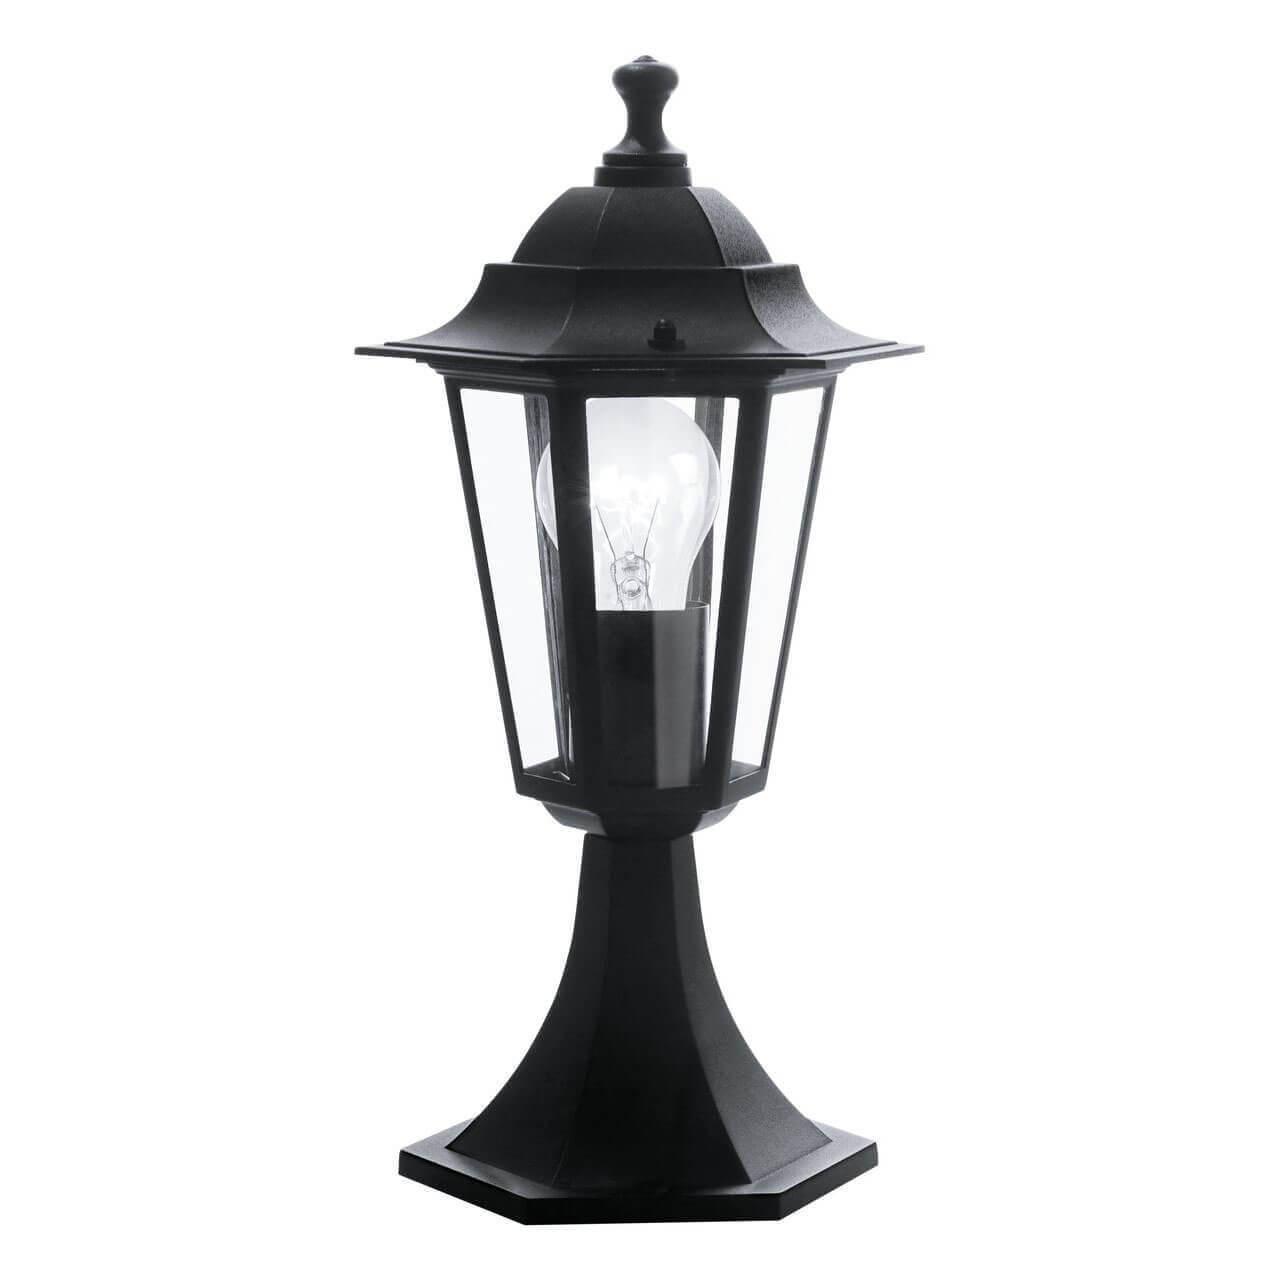 Светильник Eglo 22472 Laterna цена 2017